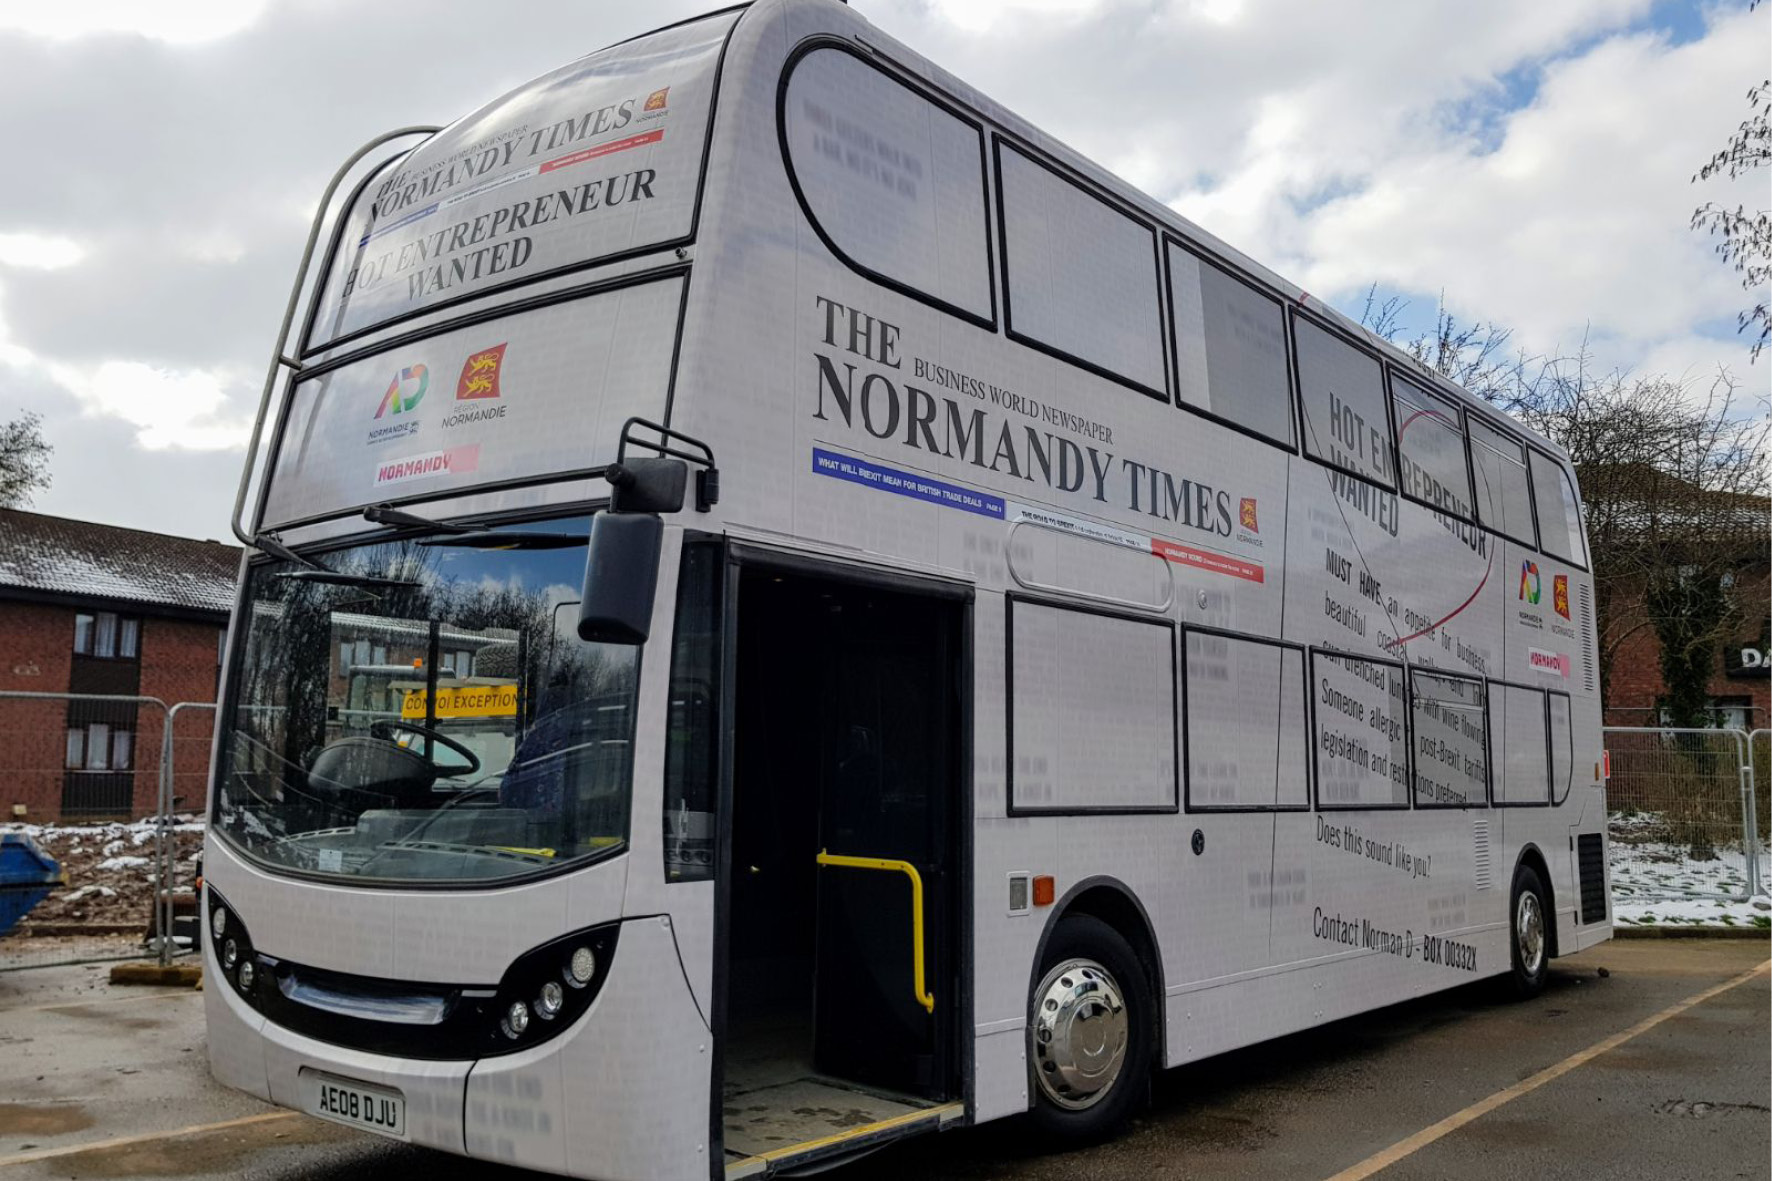 bus_business_normandy_2018_2.jpg